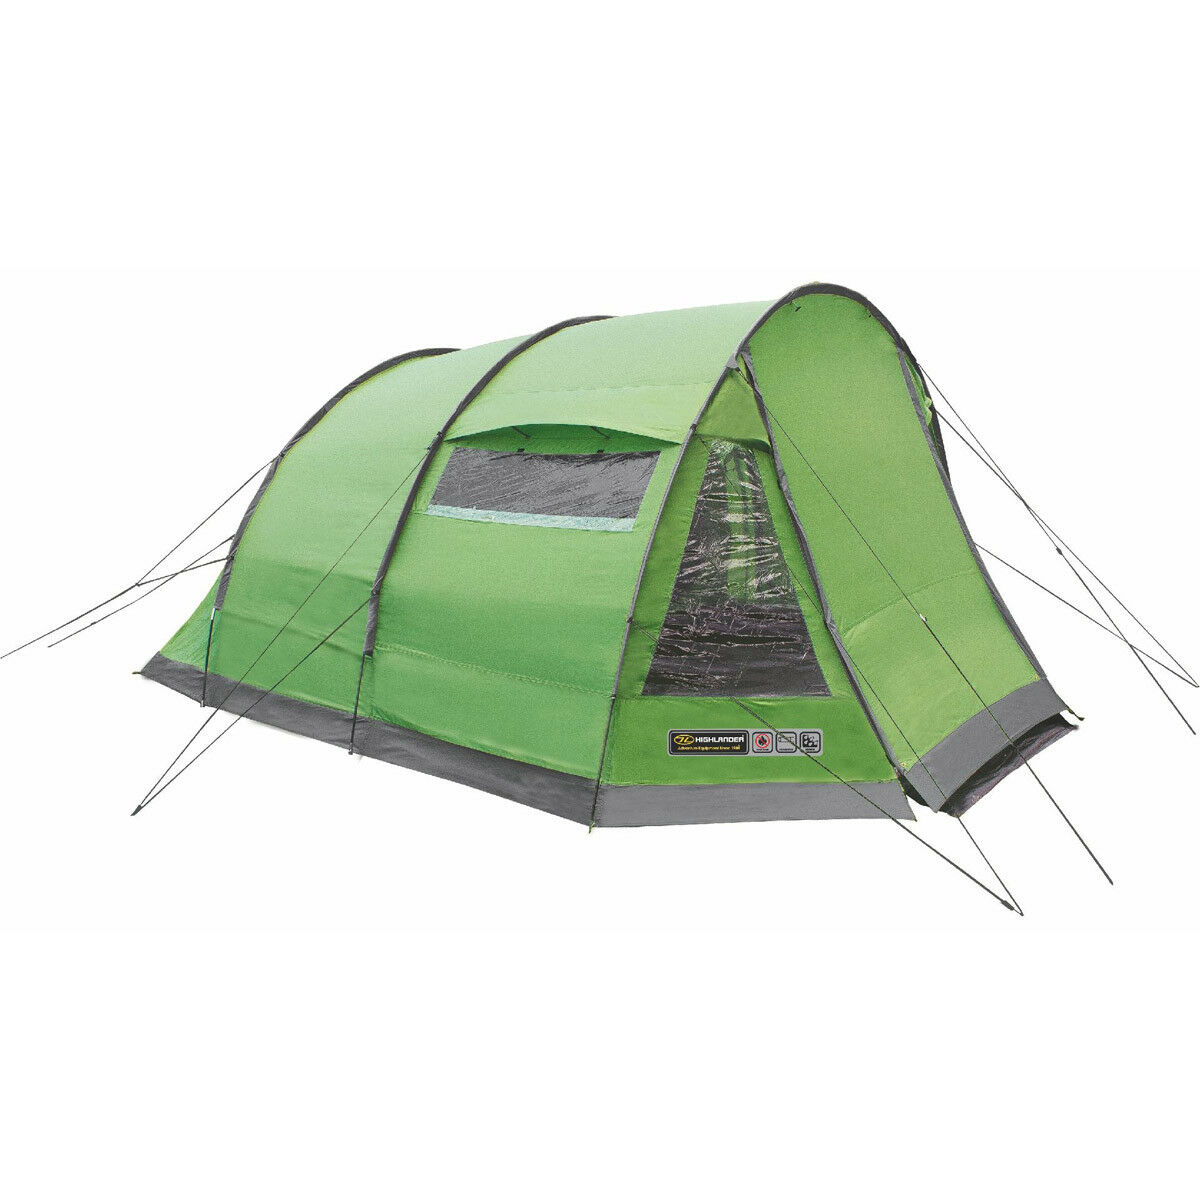 Highlander Sycamore 4 Personen Zelt Feste Camping Wochenende Wiese/Frühlingsgrün